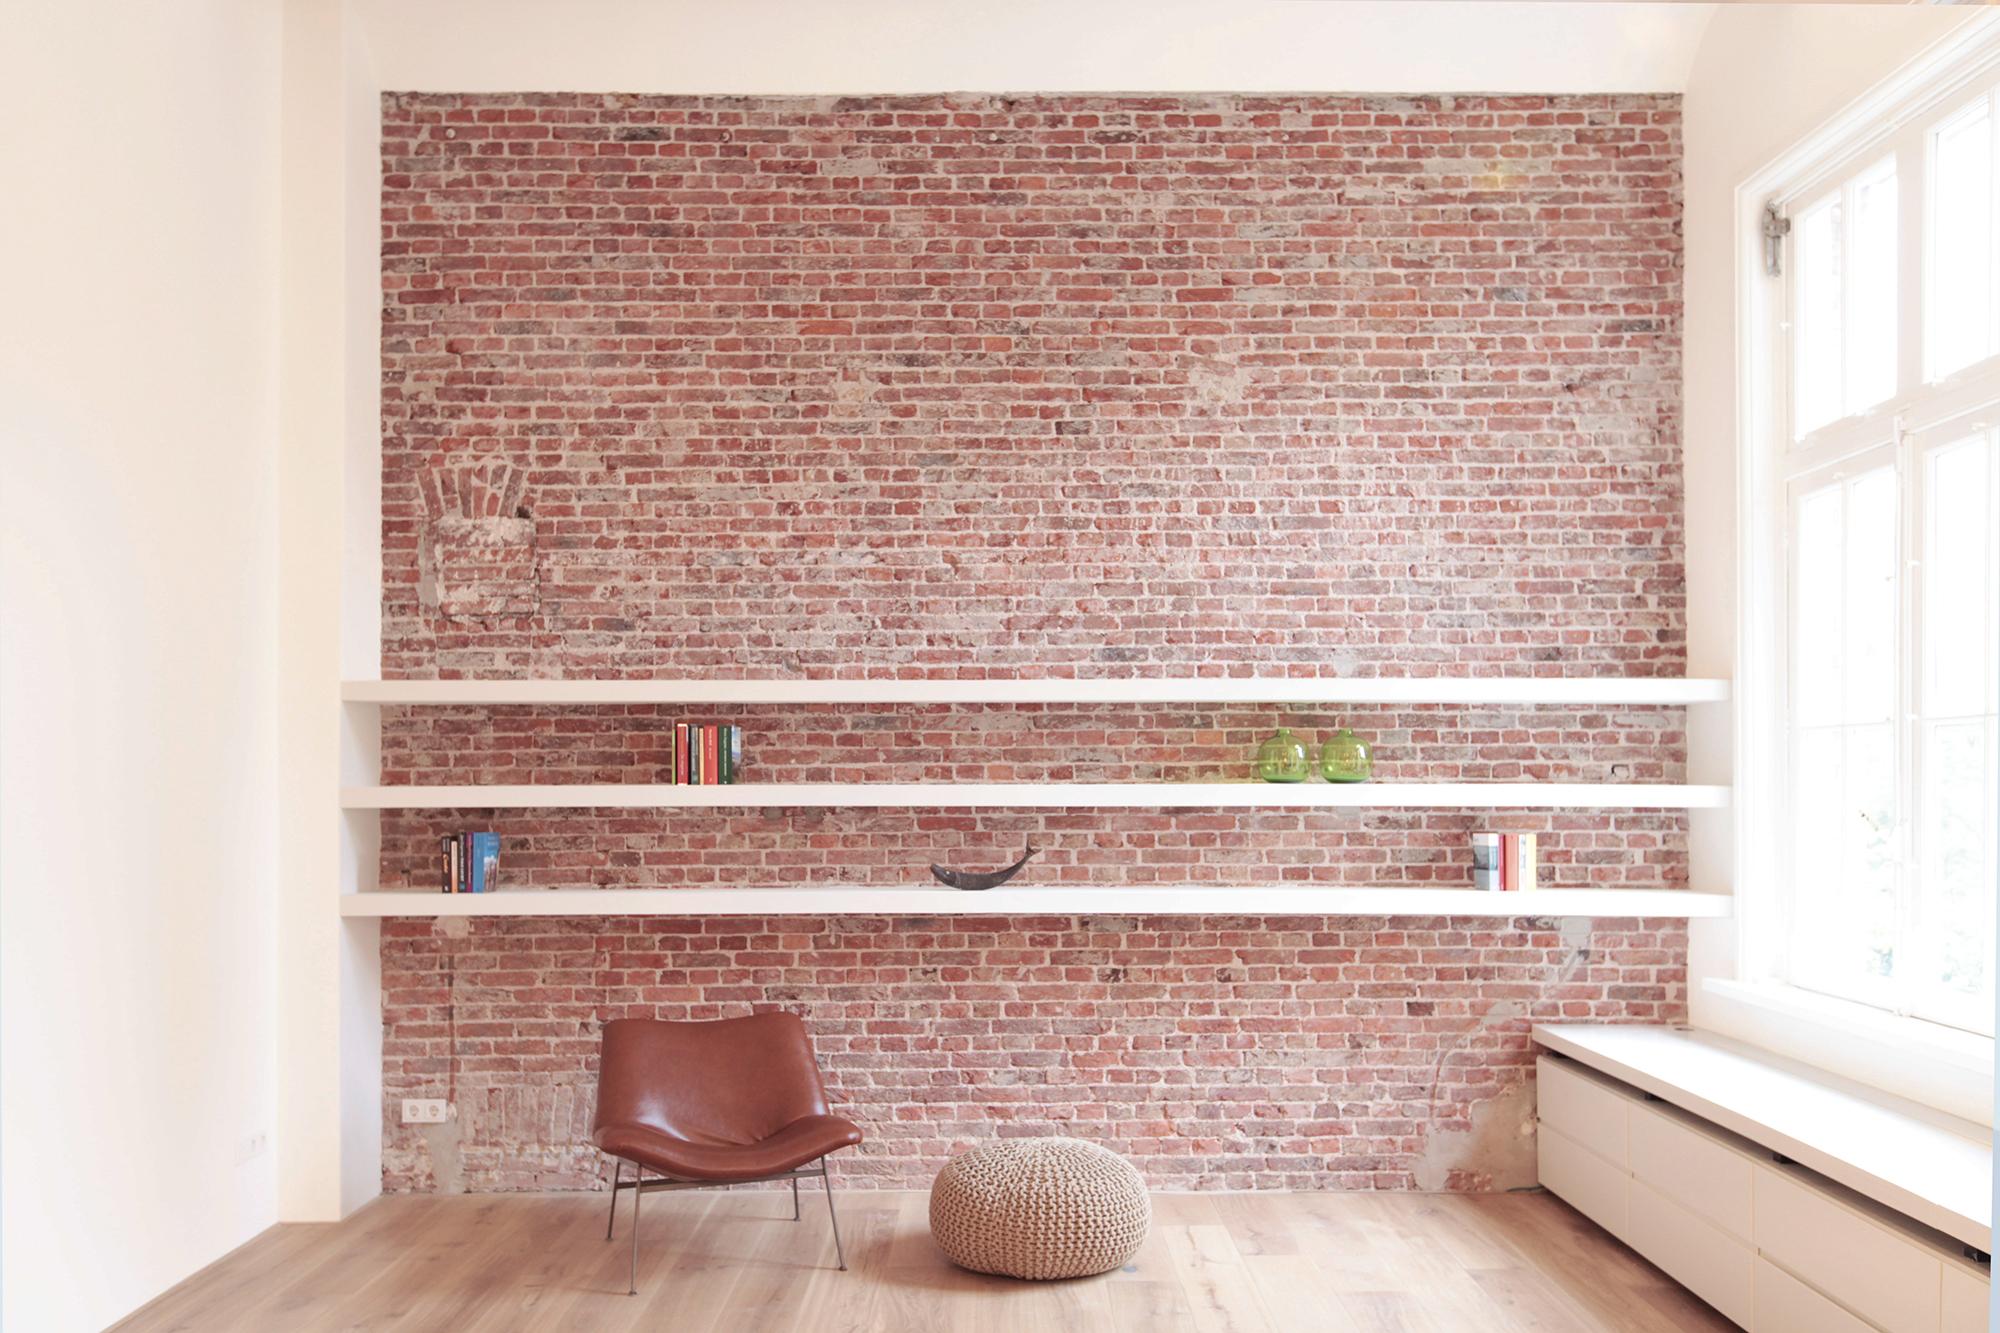 Renovatie appartement historisch pand amsterdam de architect - Entree appartement ontwerp ...